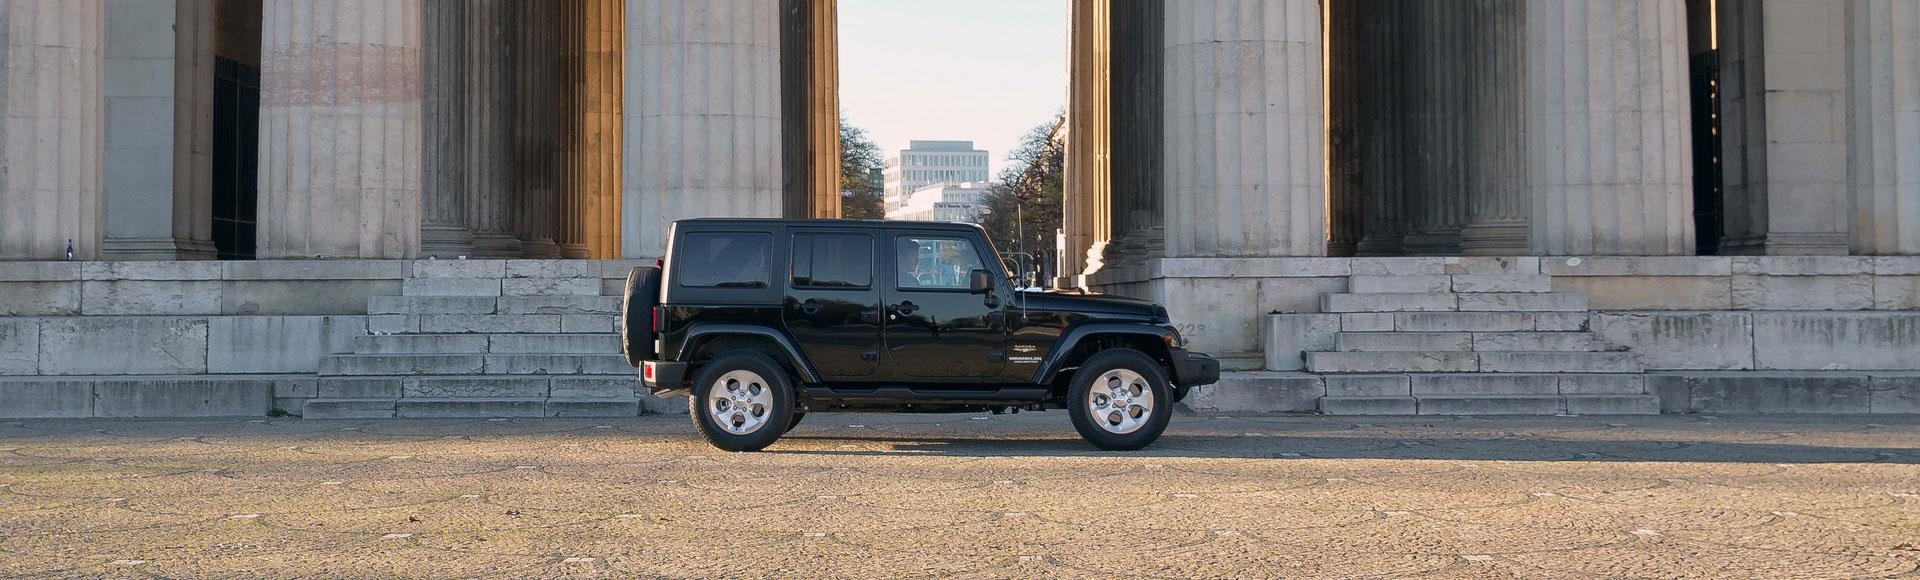 Jeep Wrangler 2015 Herbst 0053